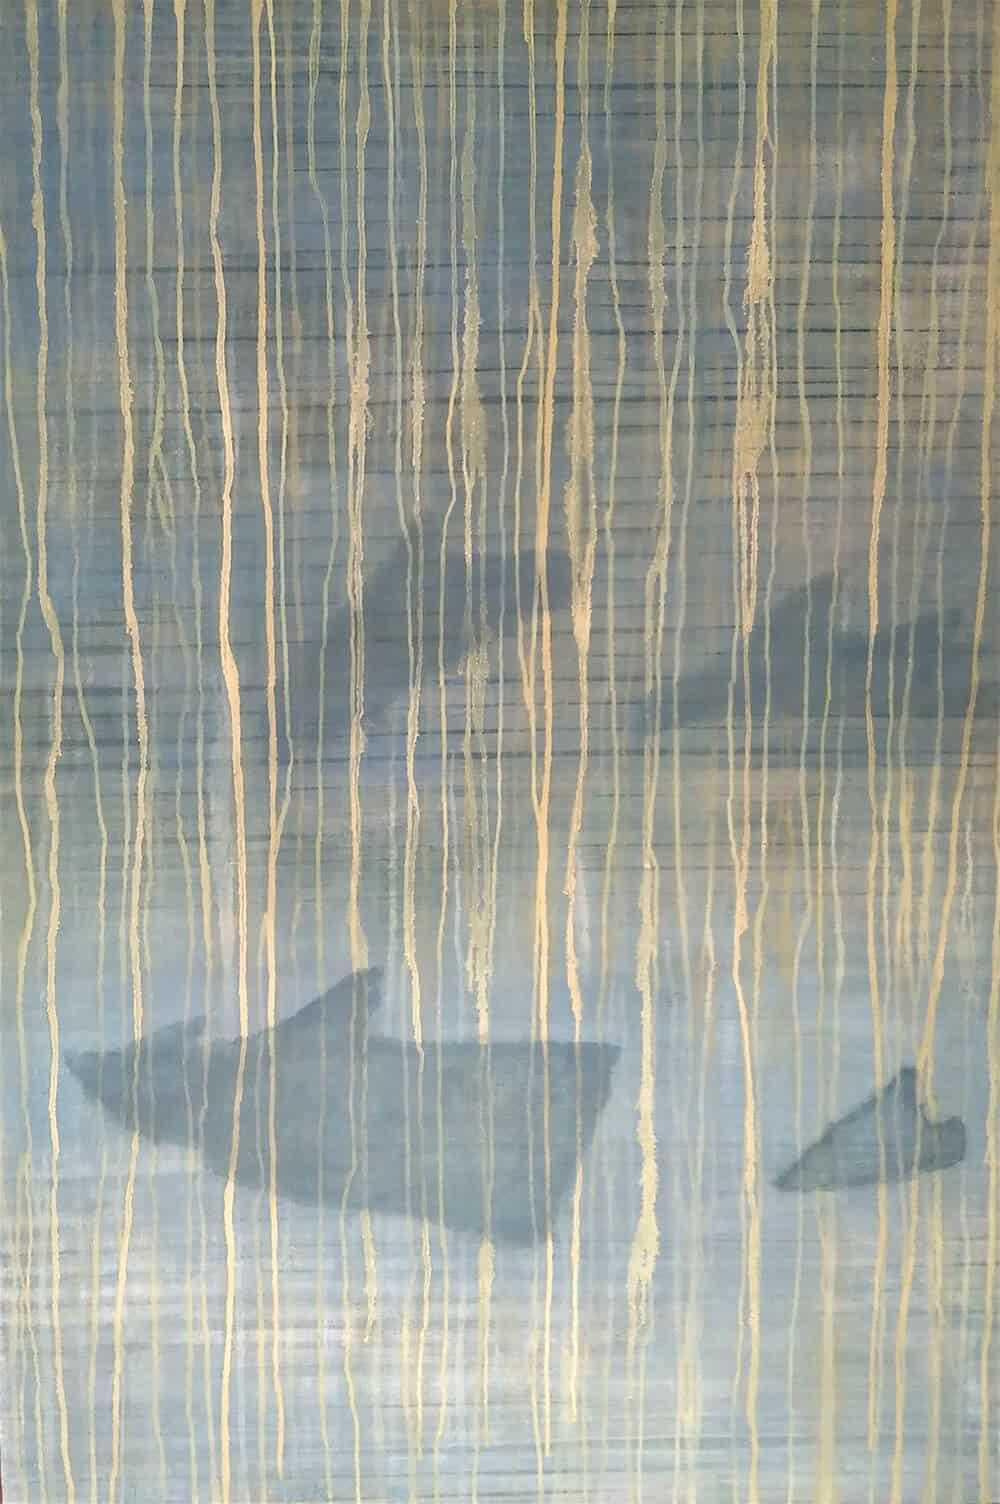 Hedi Turki, Bal des Orques, 1990. Oil on canvas, 89x130cm. Courtesy of the artist & Selma Fariani Gallery.